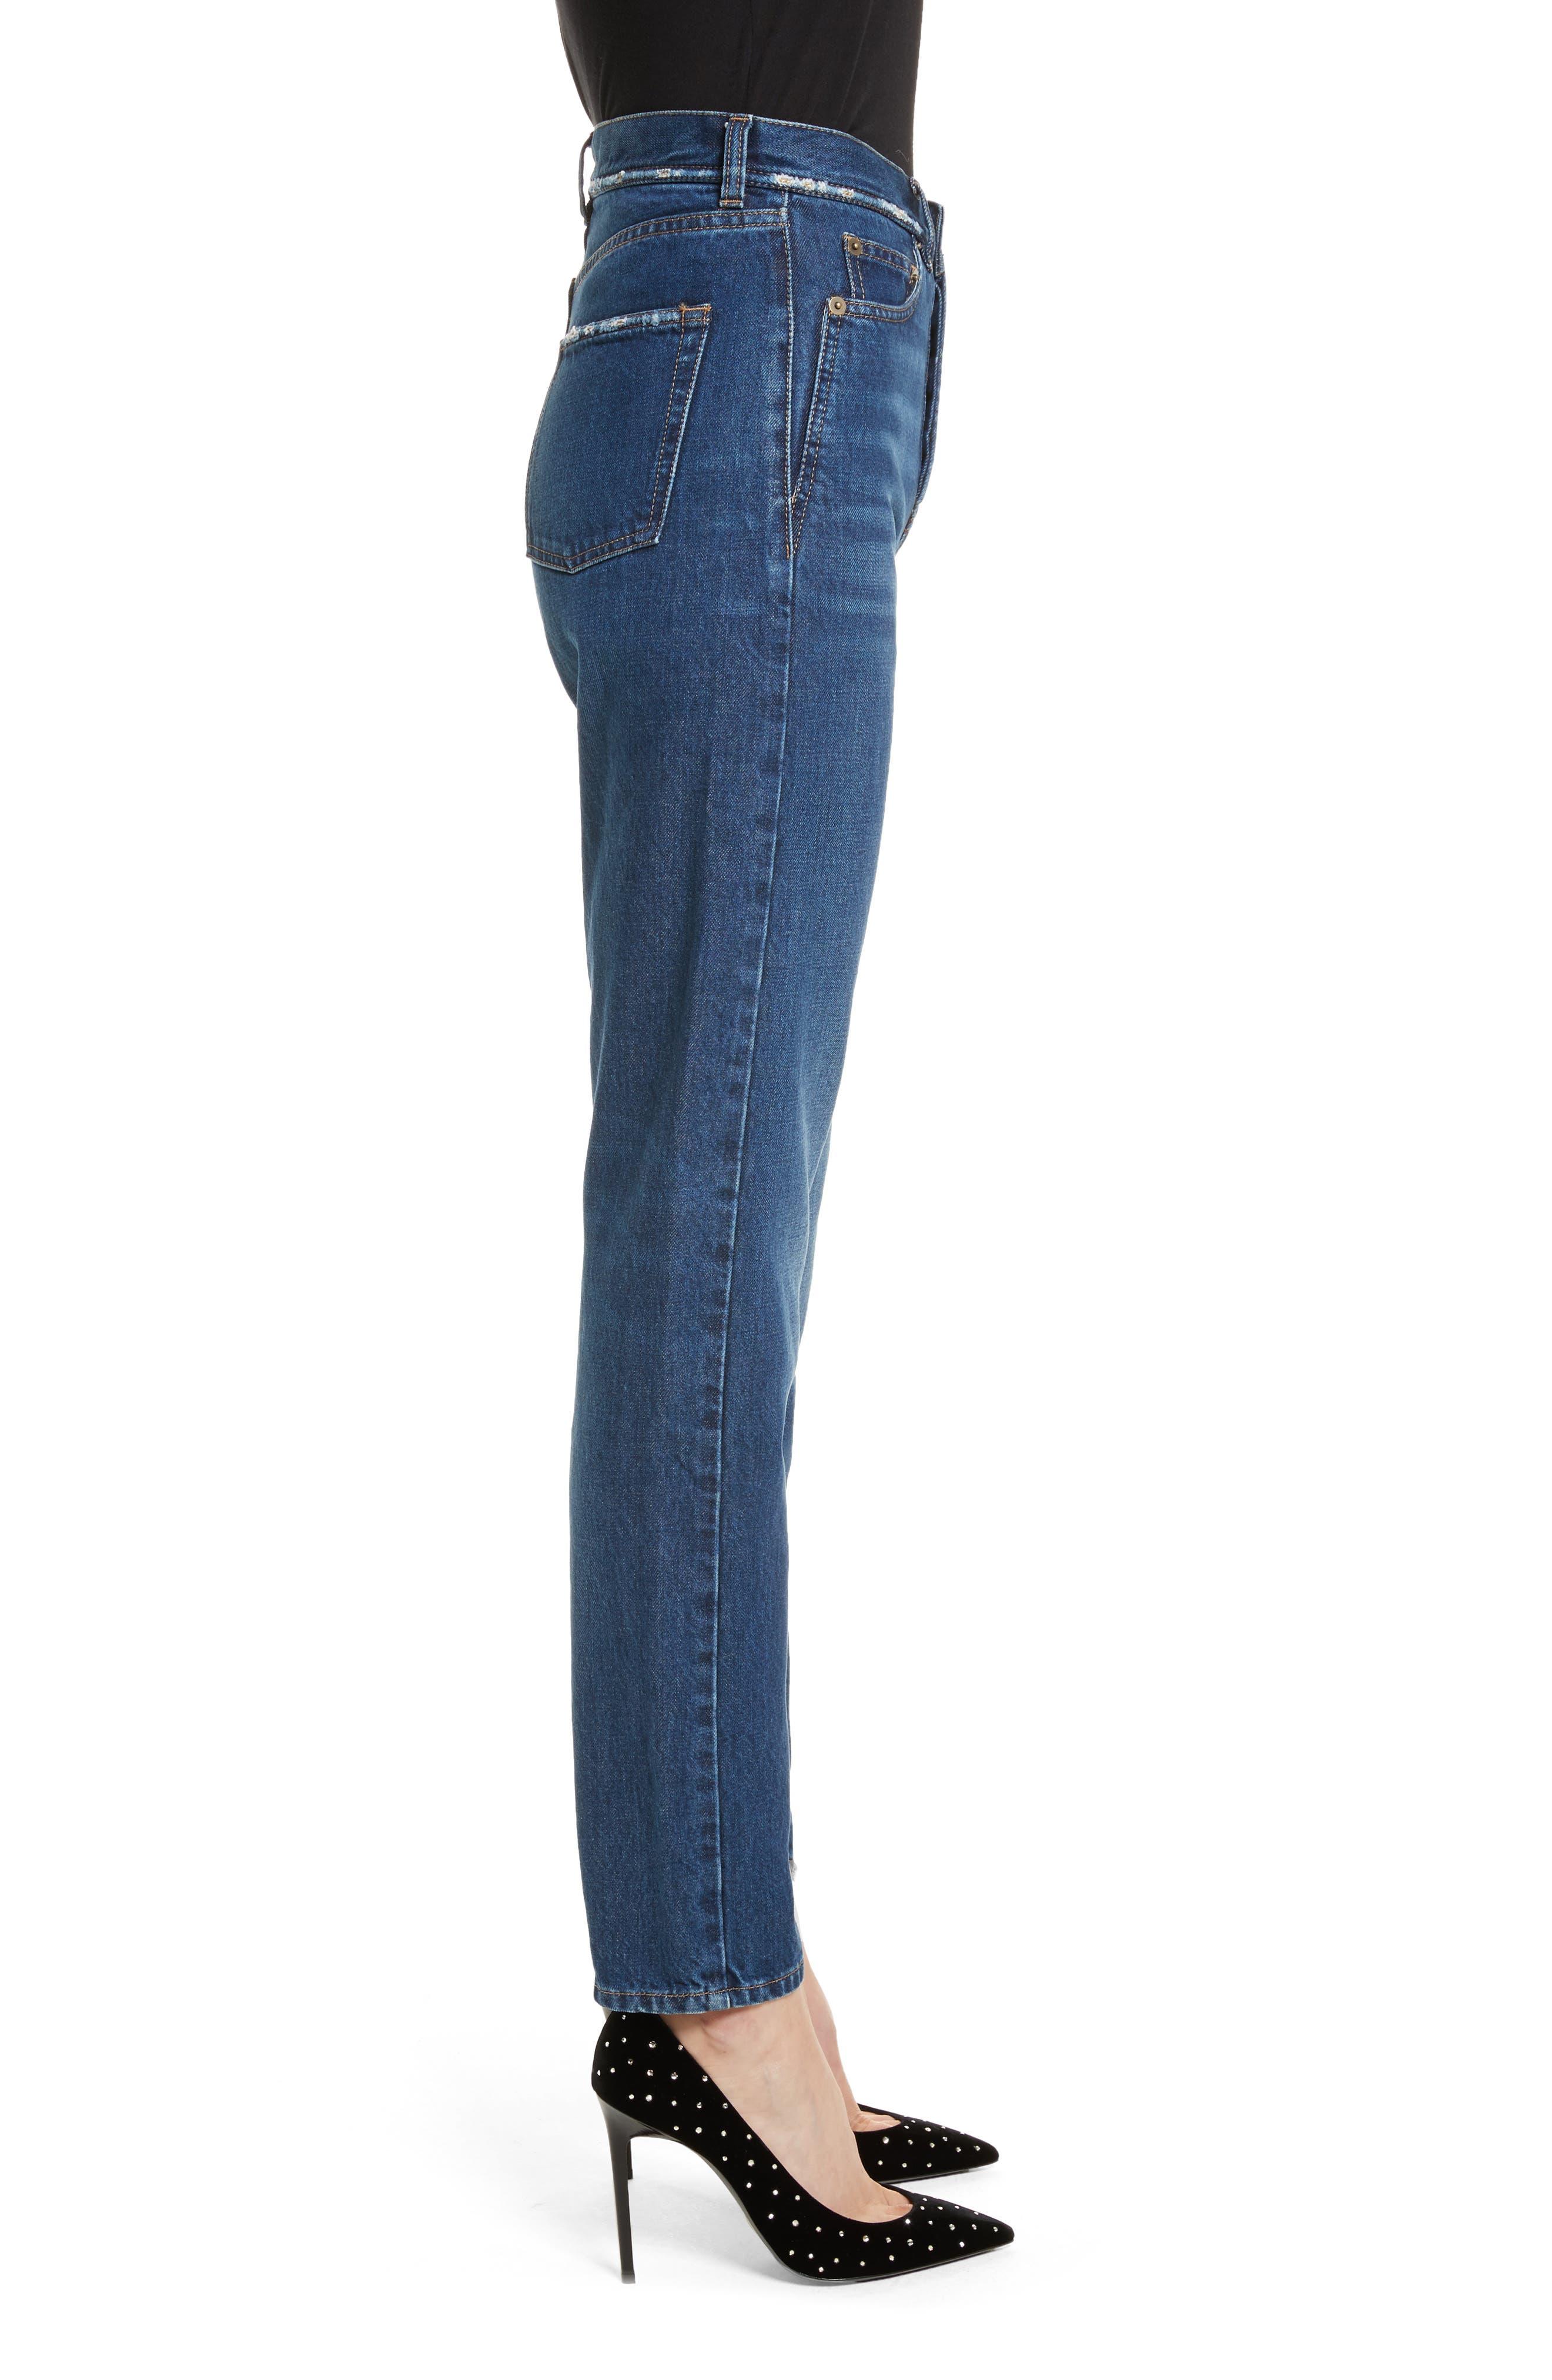 Alternate Image 3  - Saint Laurent Embroidered Jeans (Deep Dark Blue)